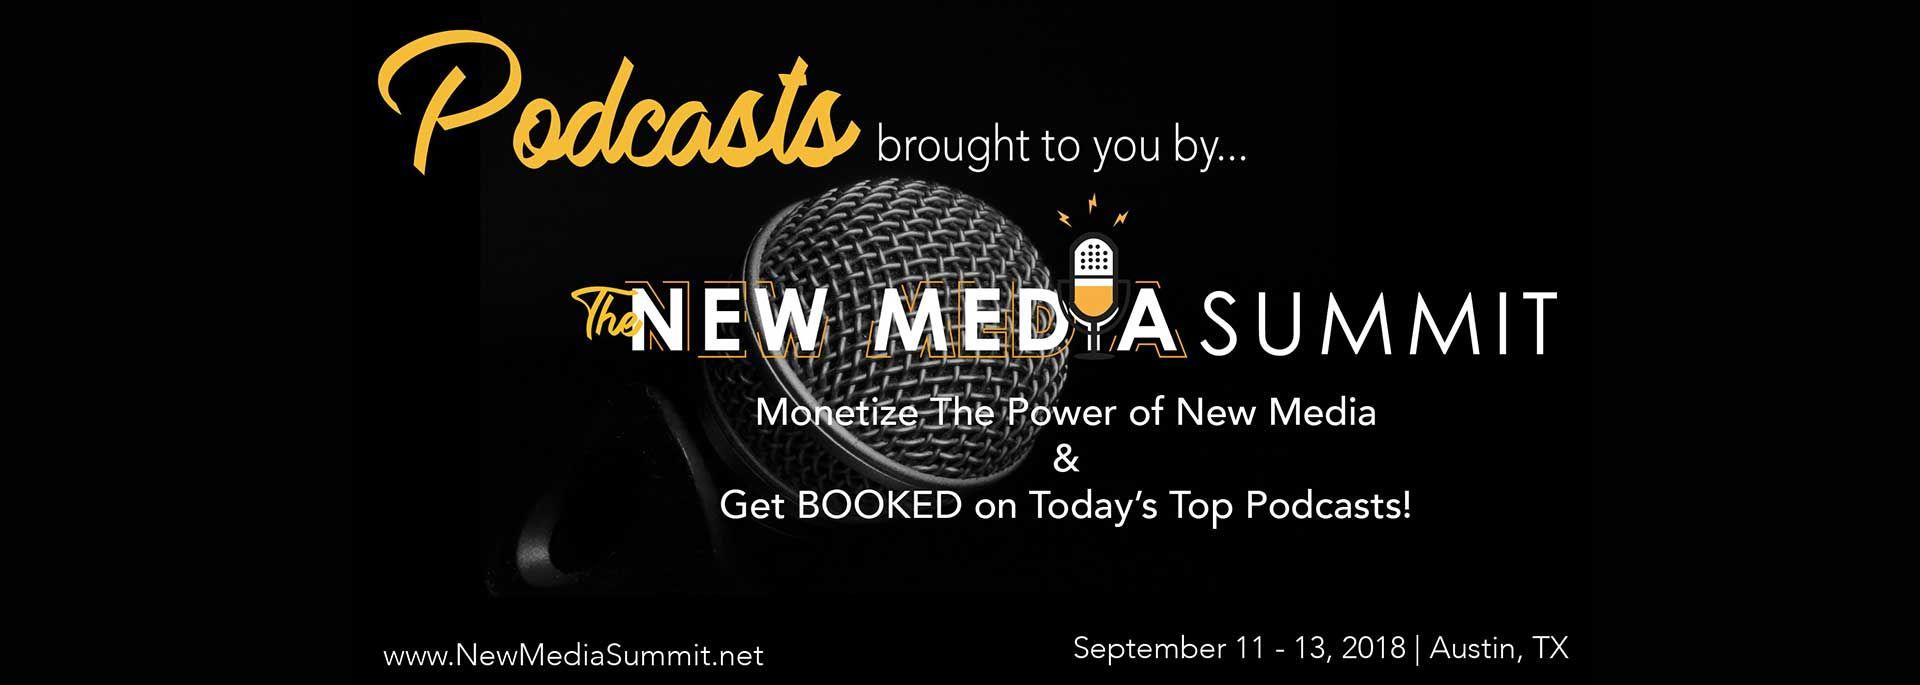 PODCASTS-NEW MEDIA SUMMIT